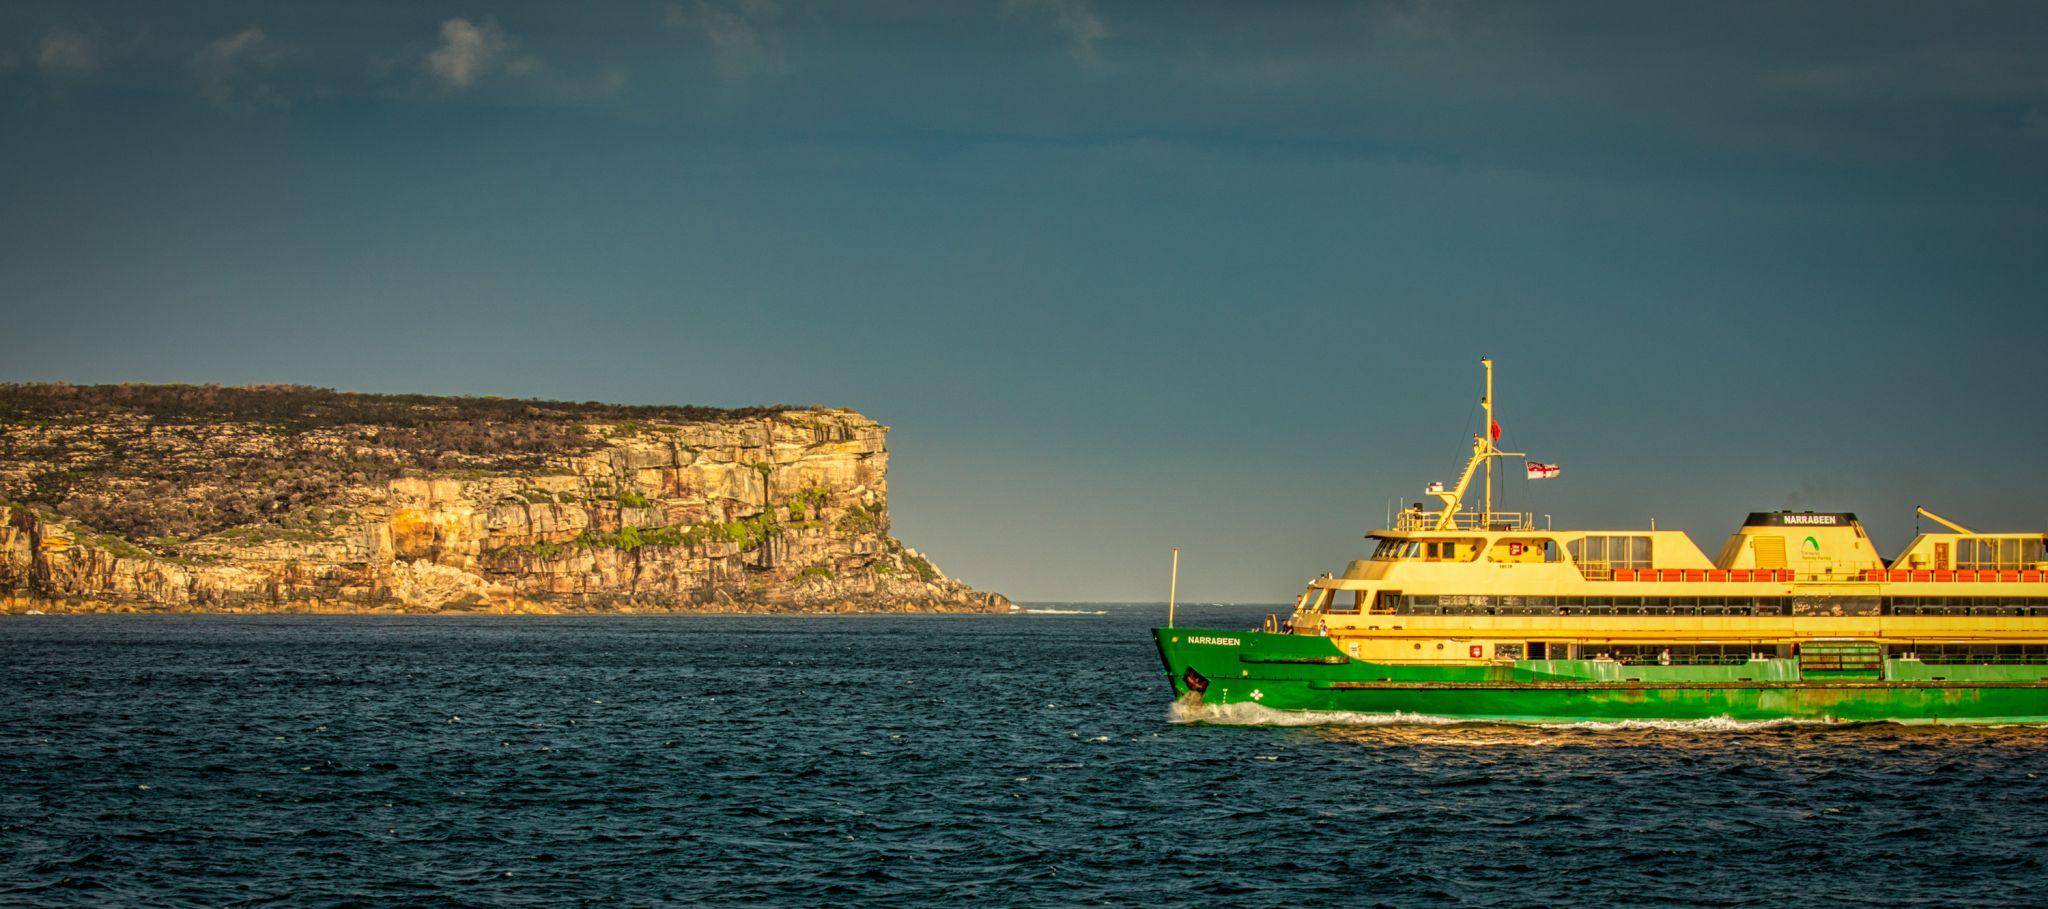 North Head & Ferry Sydney Harbour Sydney, Australia